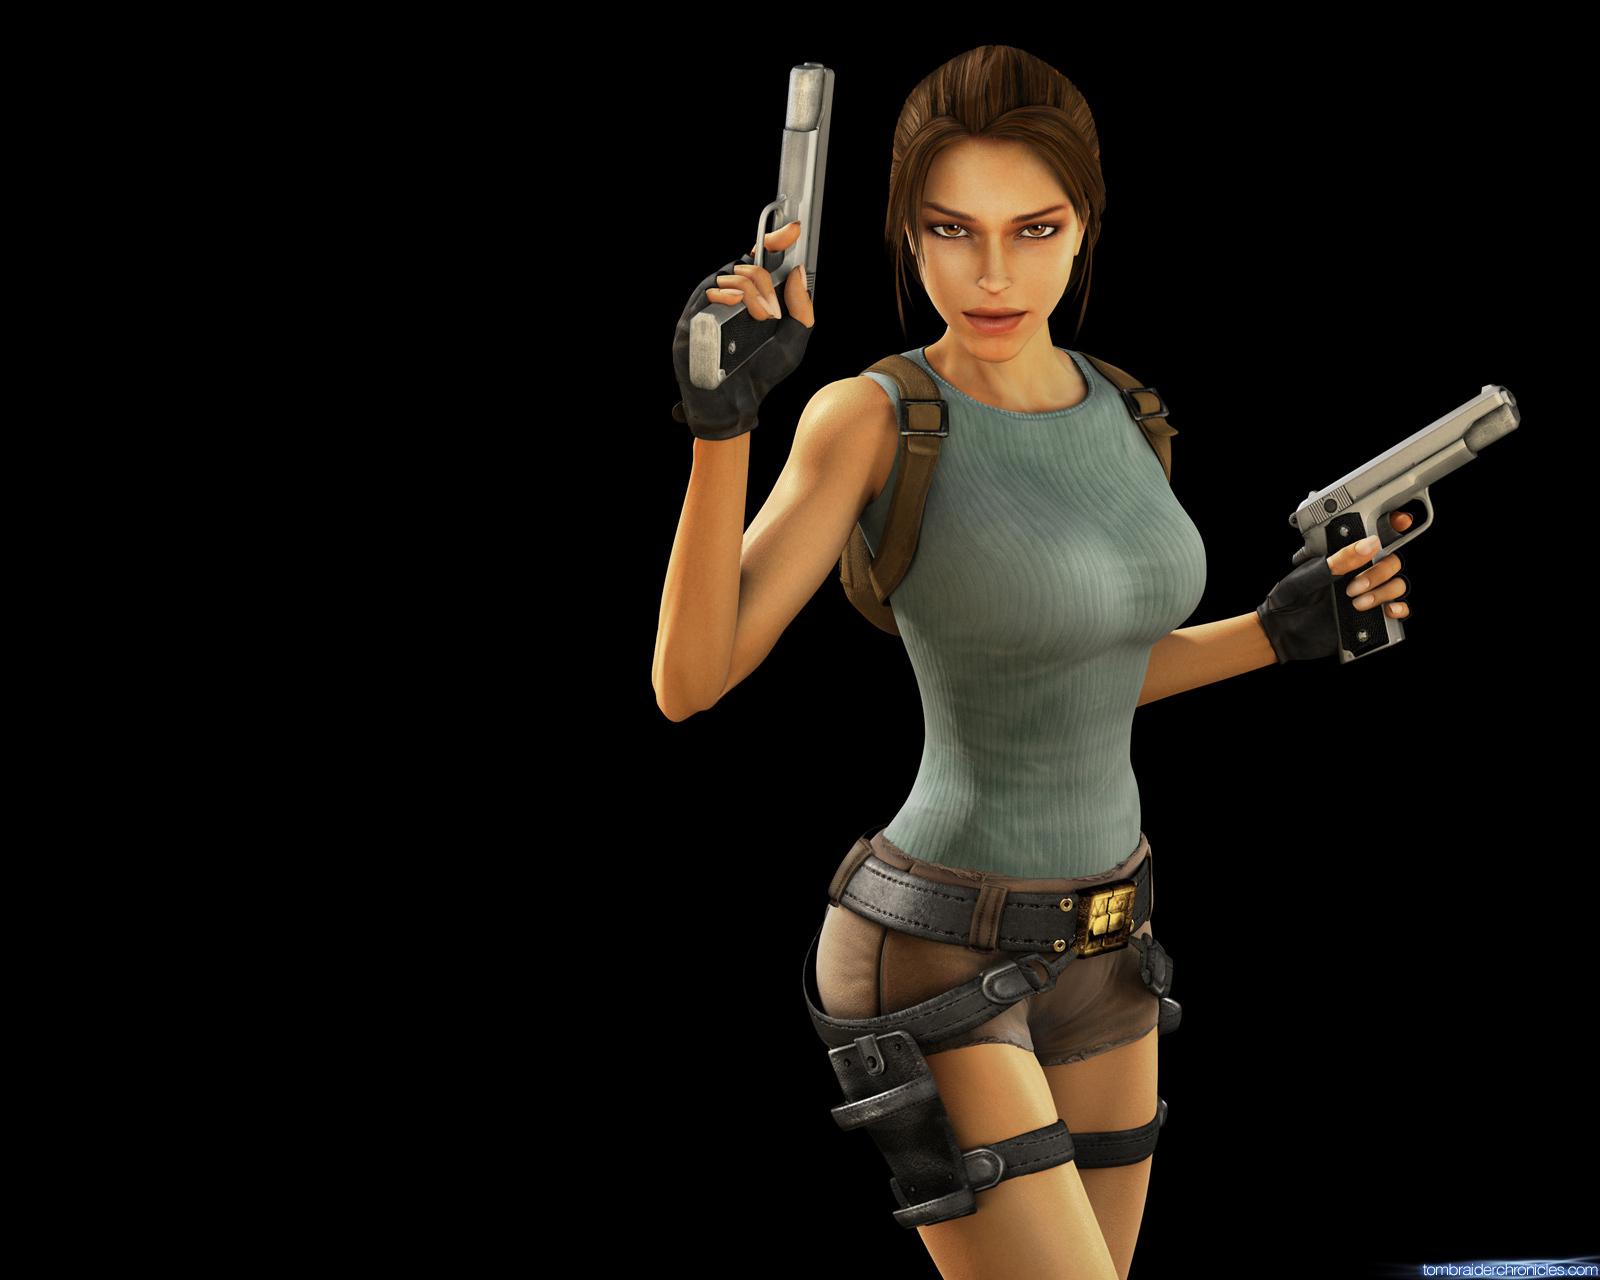 Lara Croft | Euro Palace Casino Blog